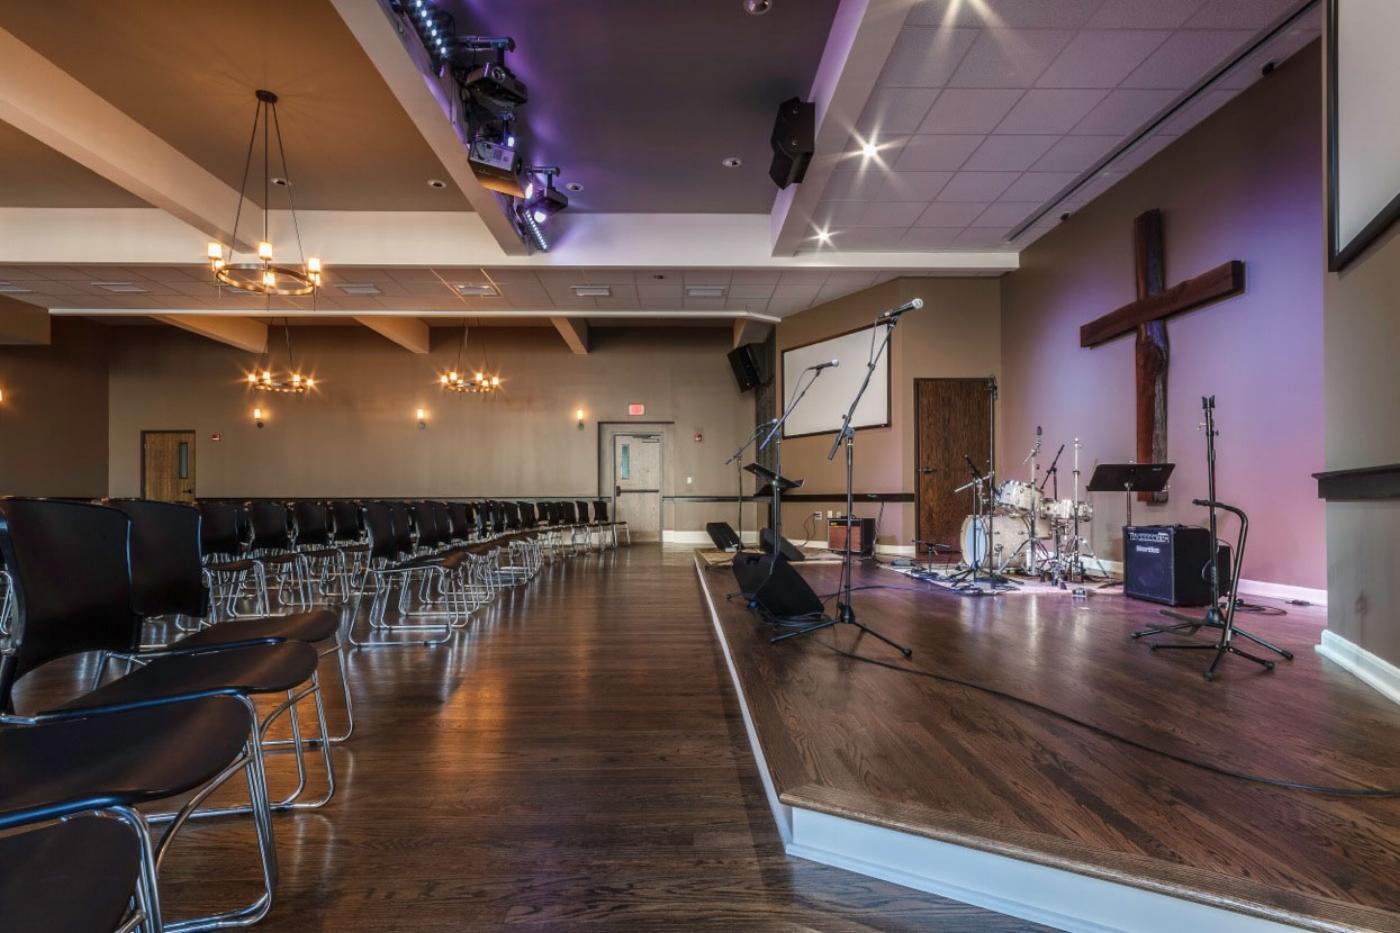 Baptist Church Floor Remodeling